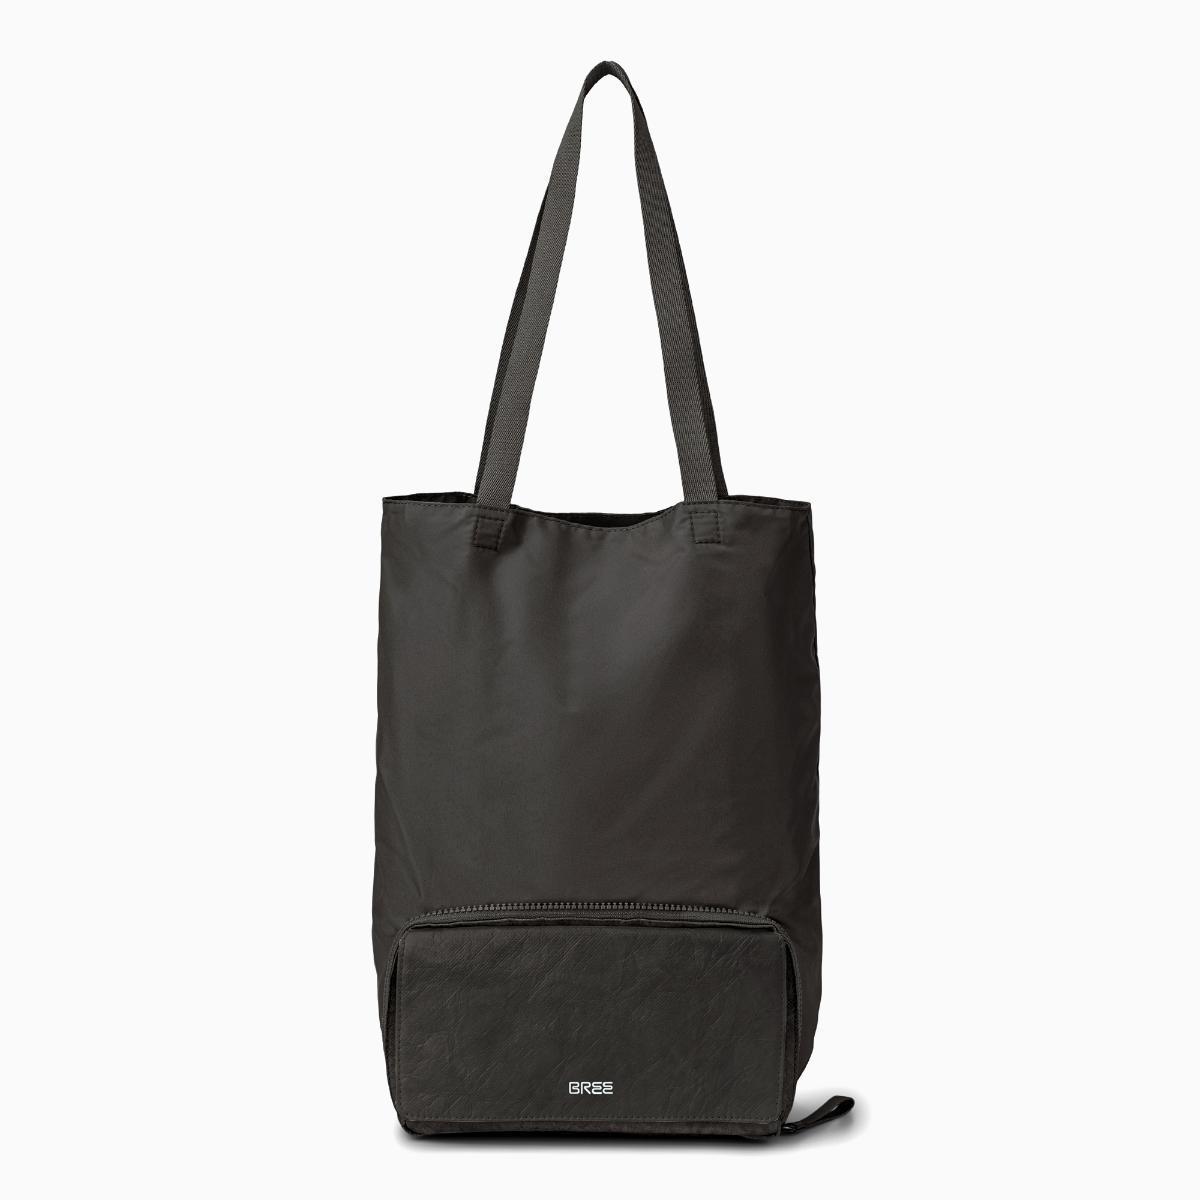 PNCH Vary 3 - Black - Belt Bag